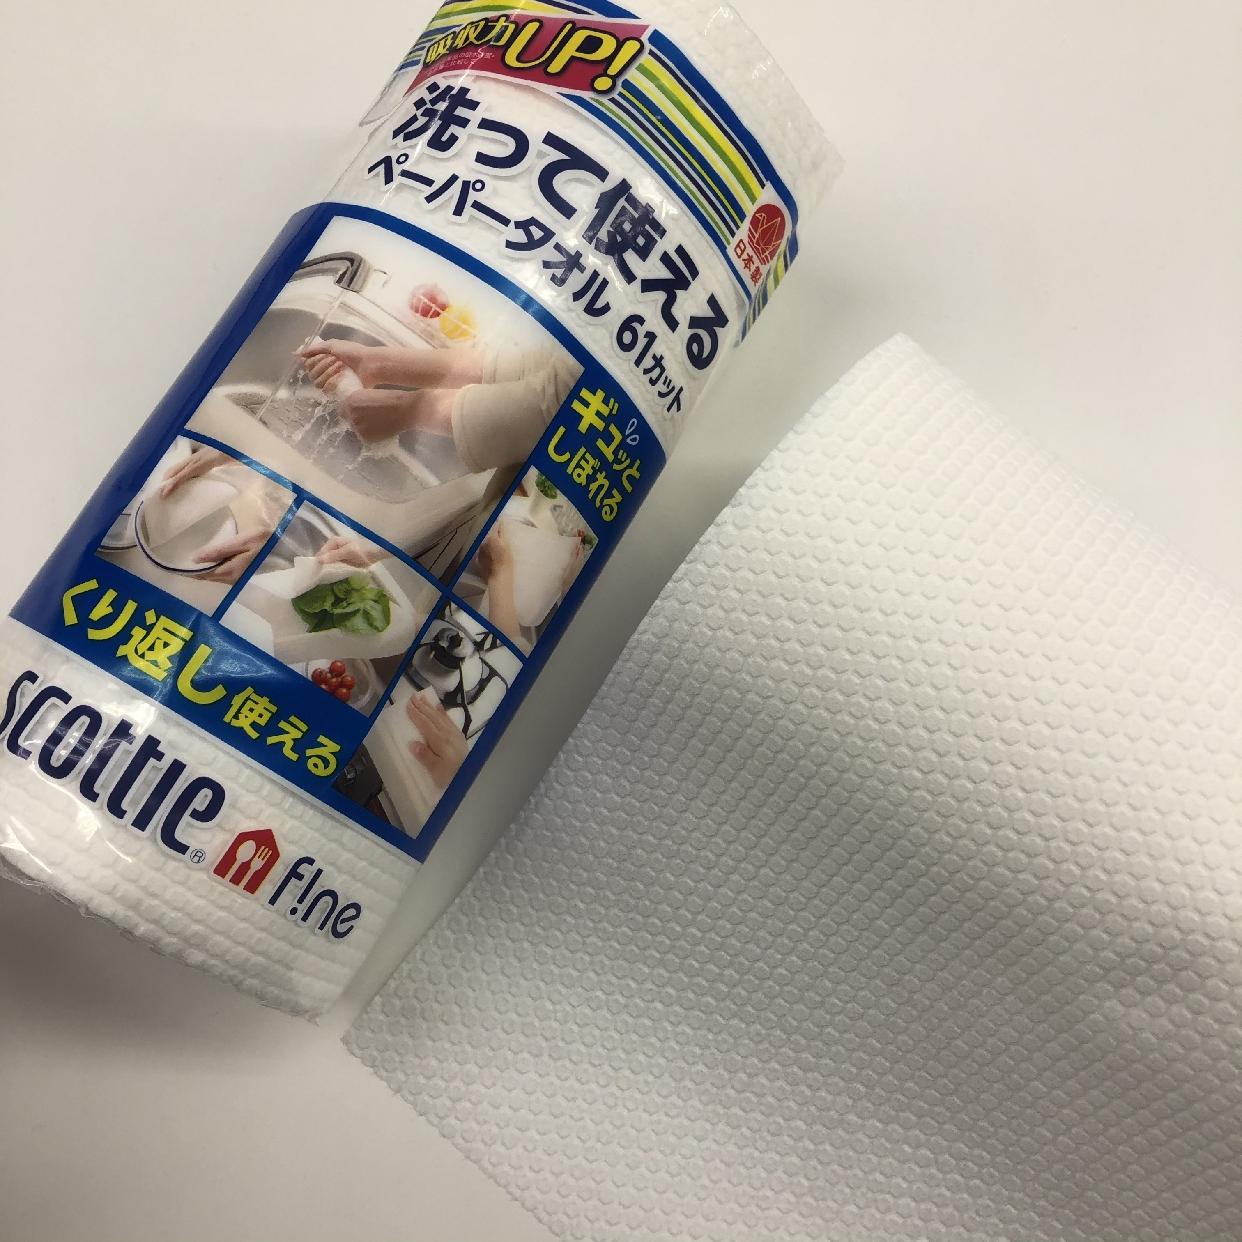 SCOTTIE fine(スコッティファイン)洗って使えるペーパータオル プリント 52カット1ロールを使った わっきーさんのクチコミ画像